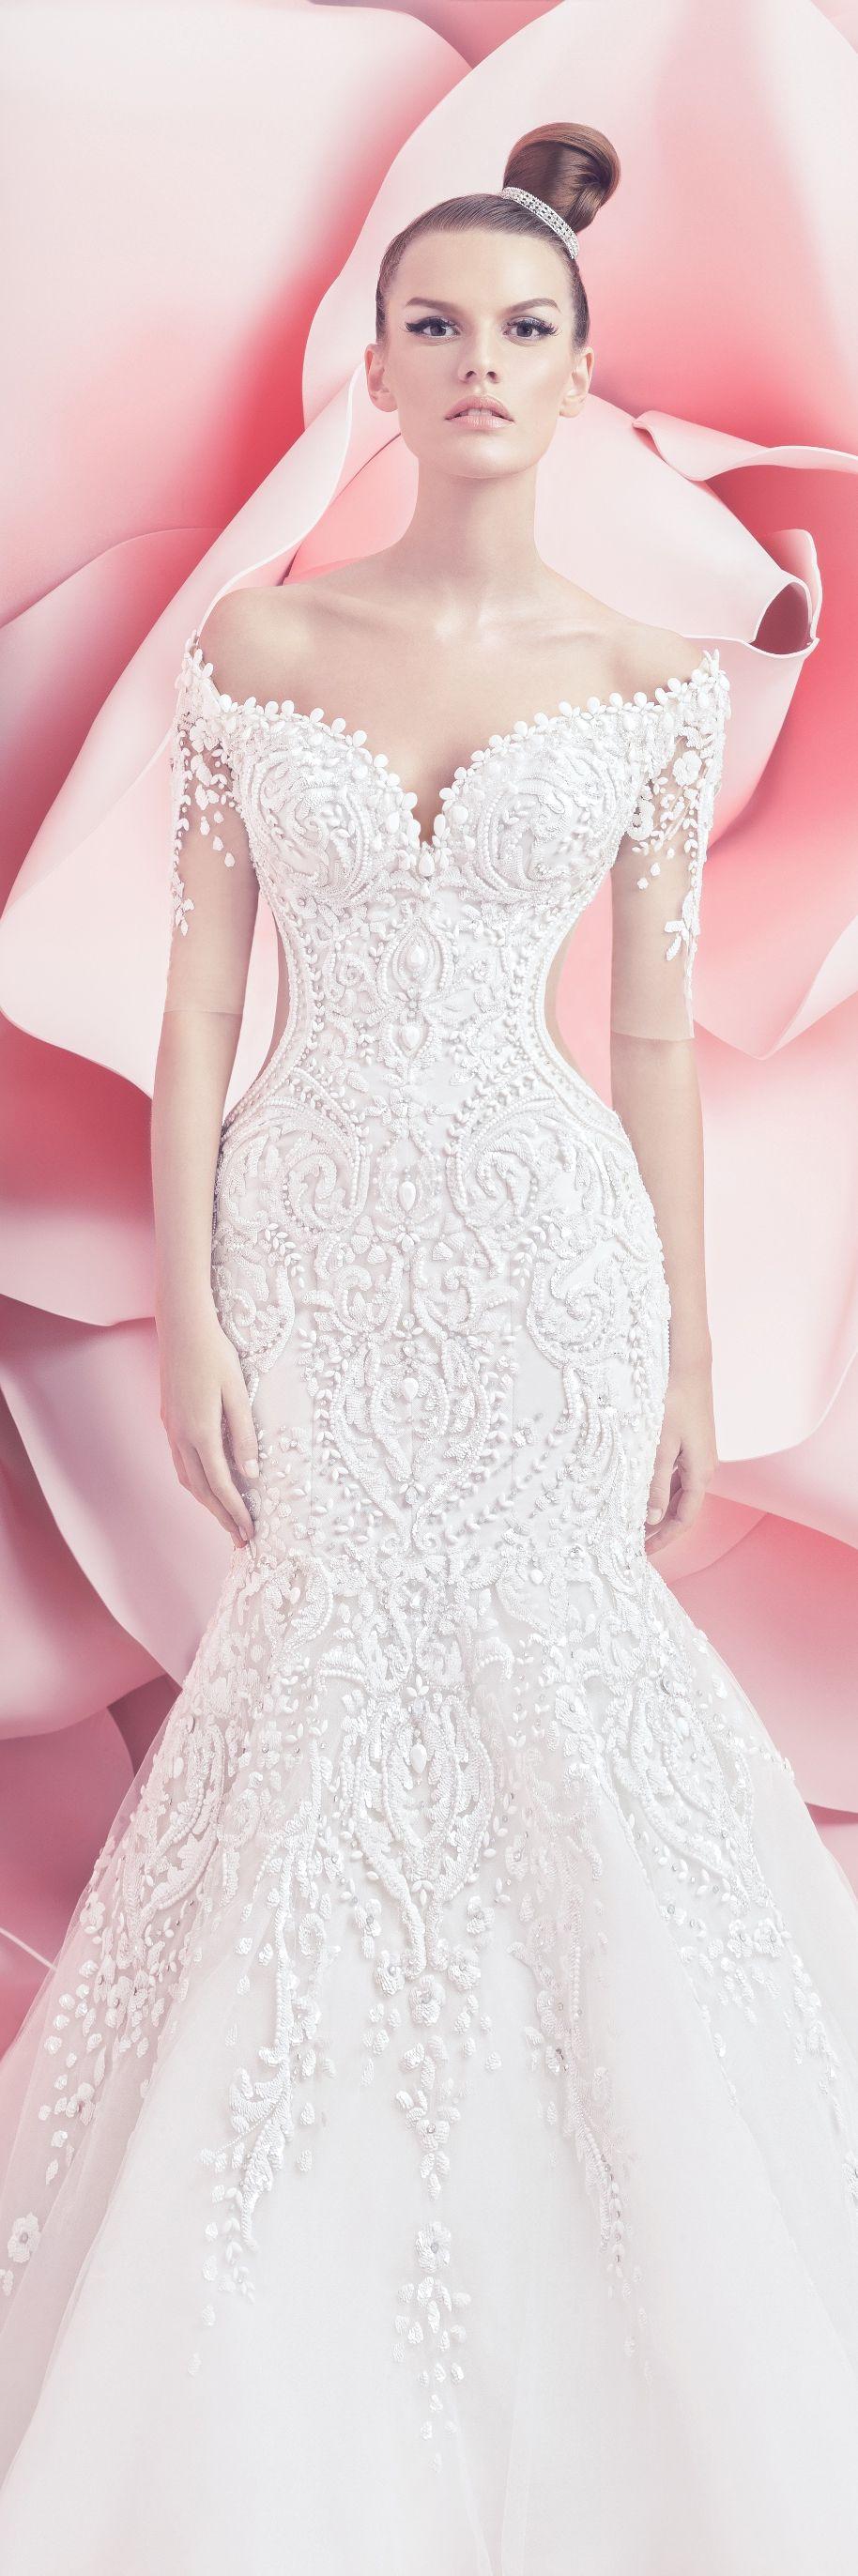 Peaches geldof wedding dress  Michael Cinco Bridal Spring Summer  Collection  Michael Cinco